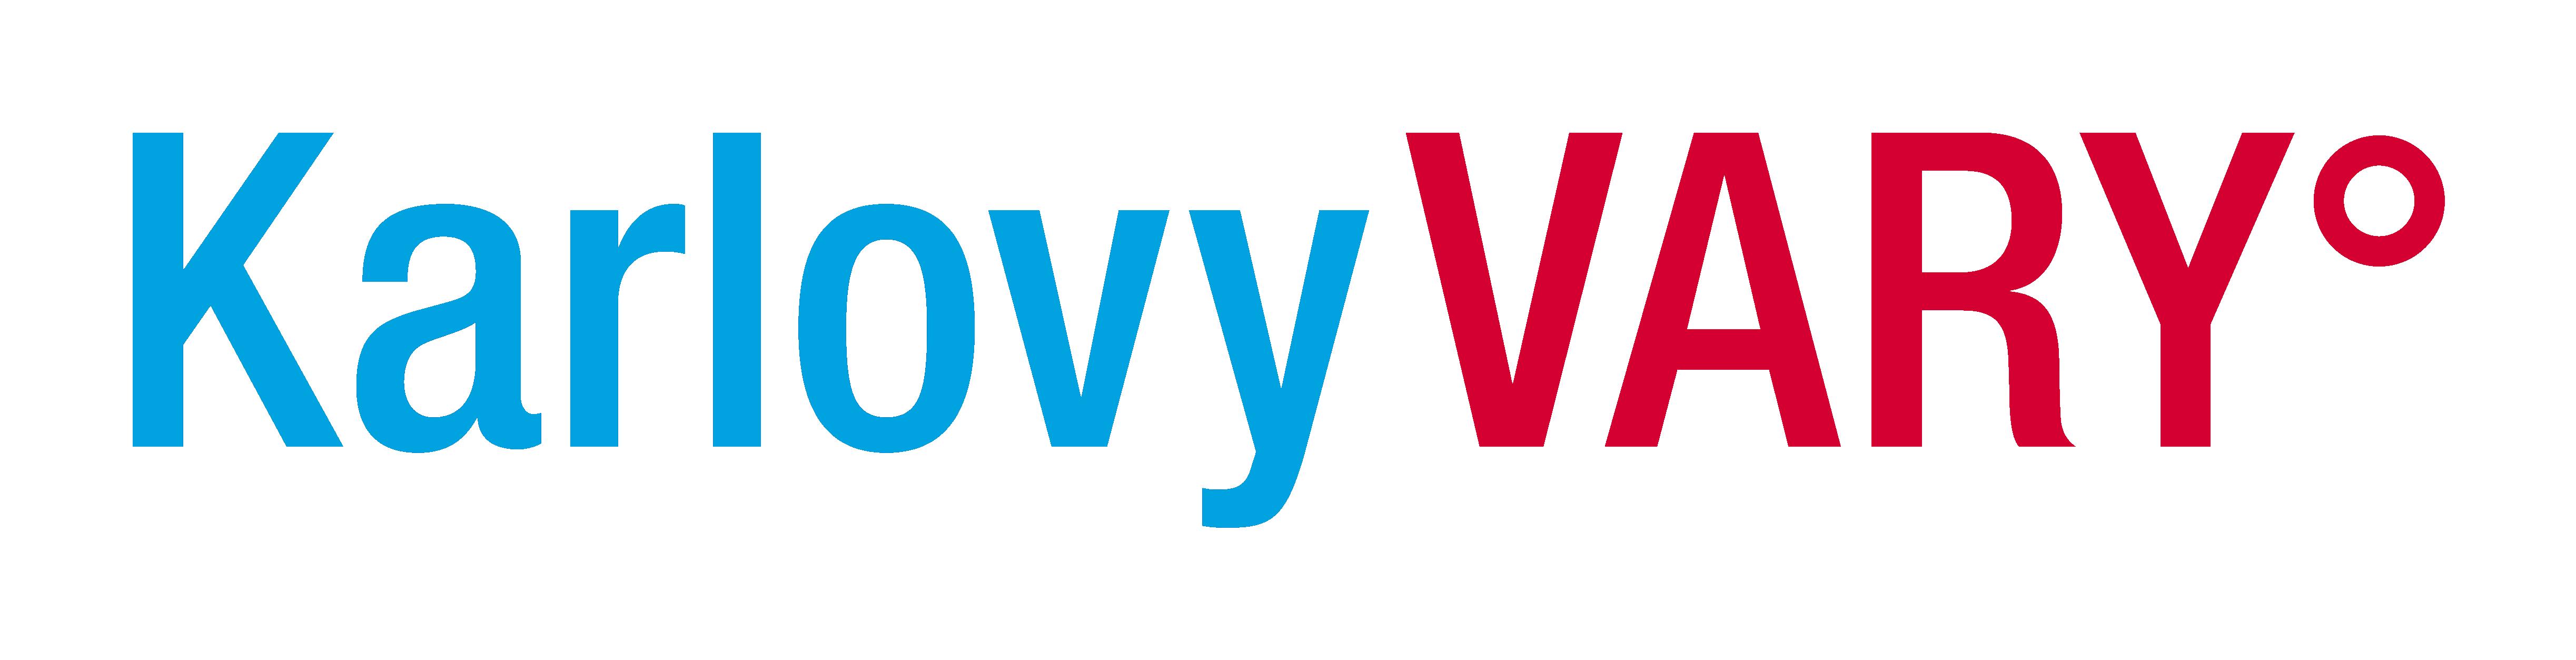 Výsledek obrázku pro karlovy vary logo